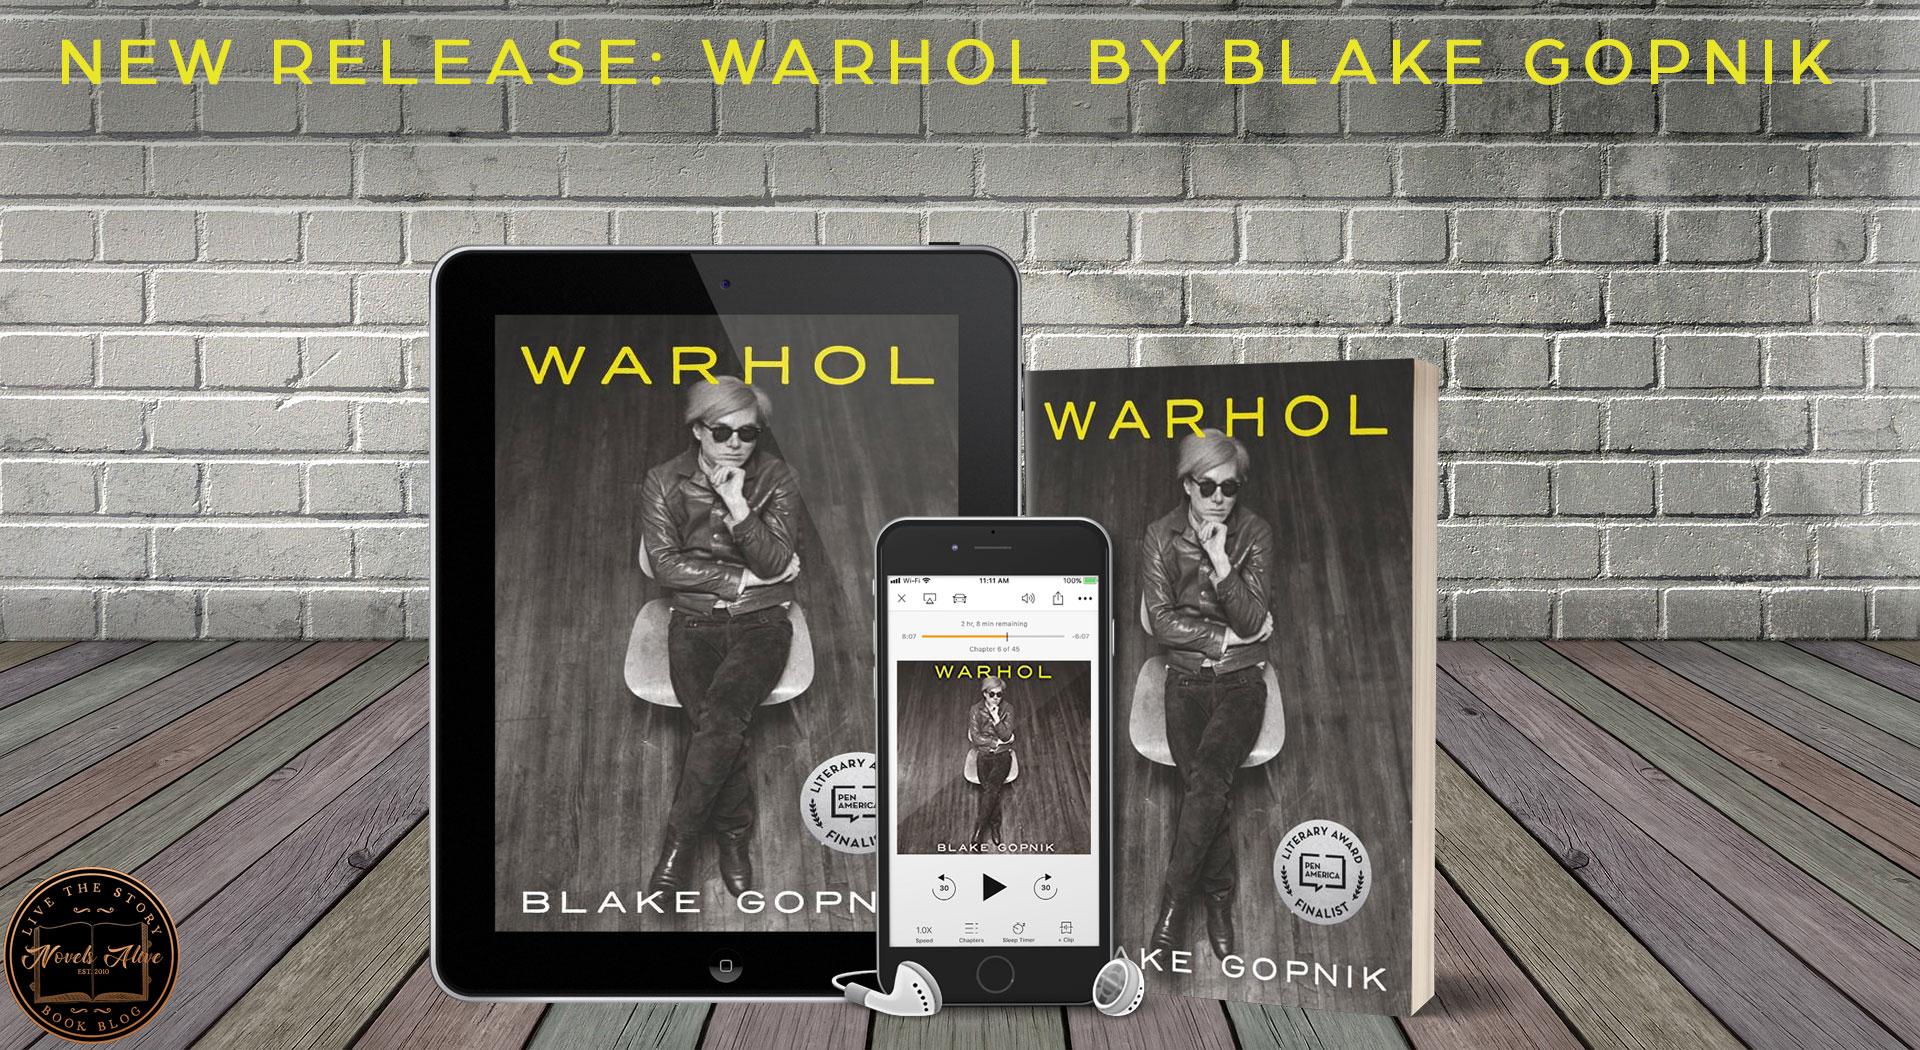 Warhol-NEWRELEASE-FB